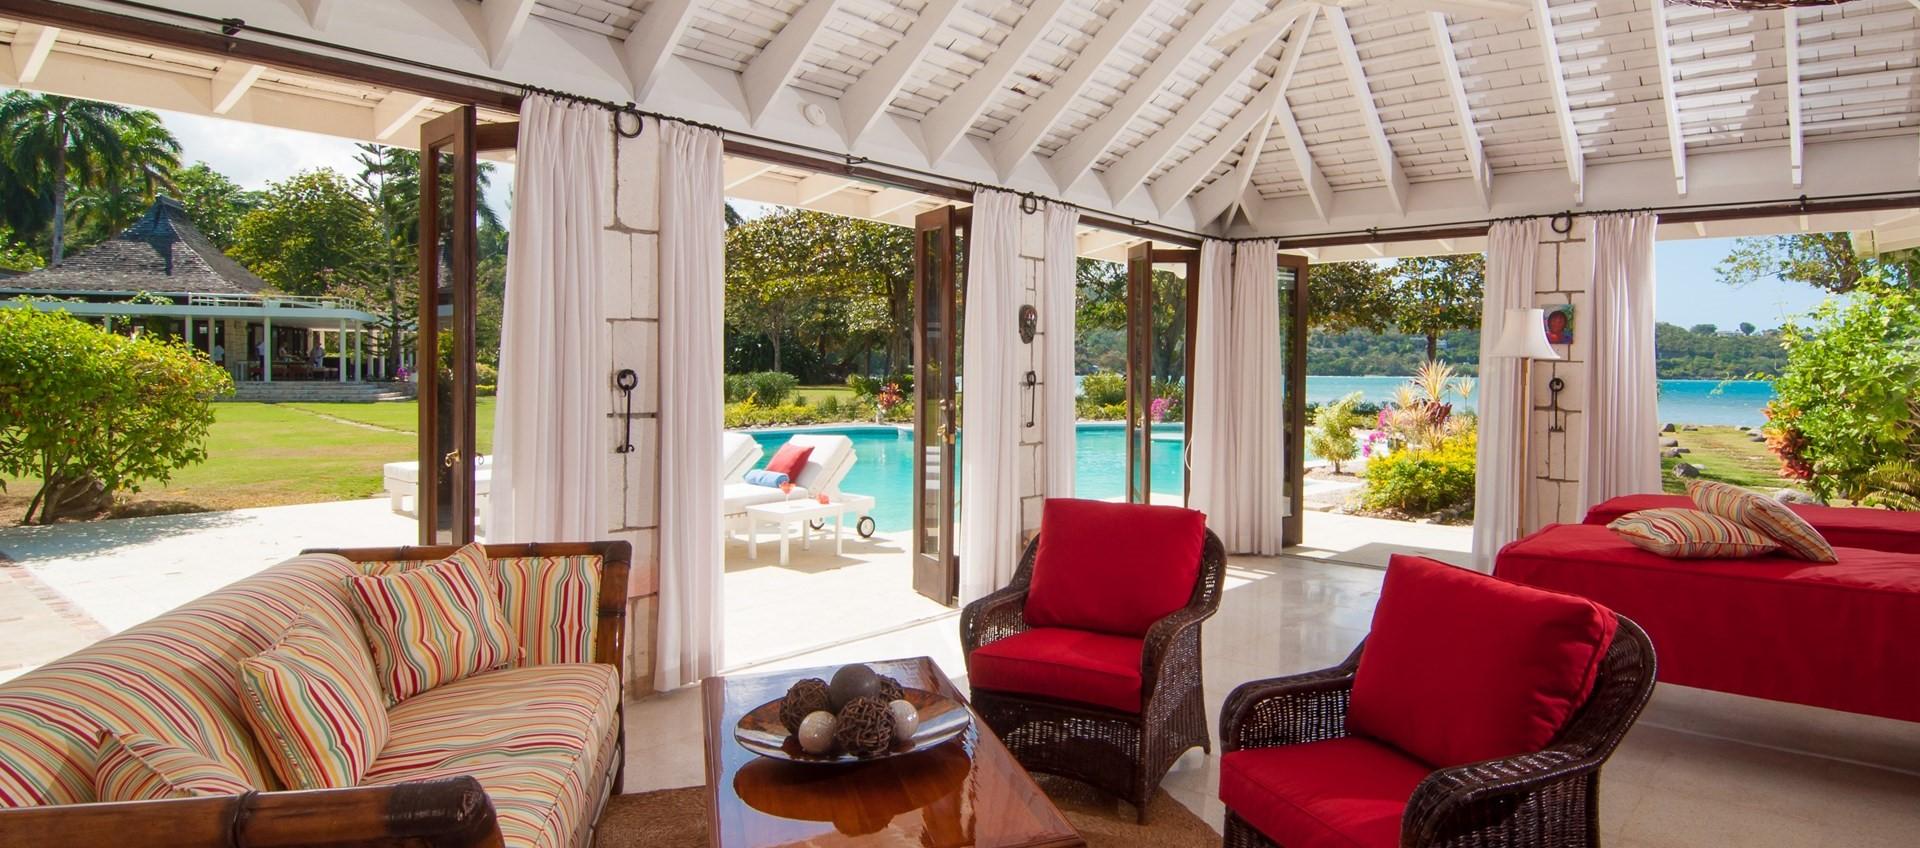 noble-house-beach-villa-pool-pavilion